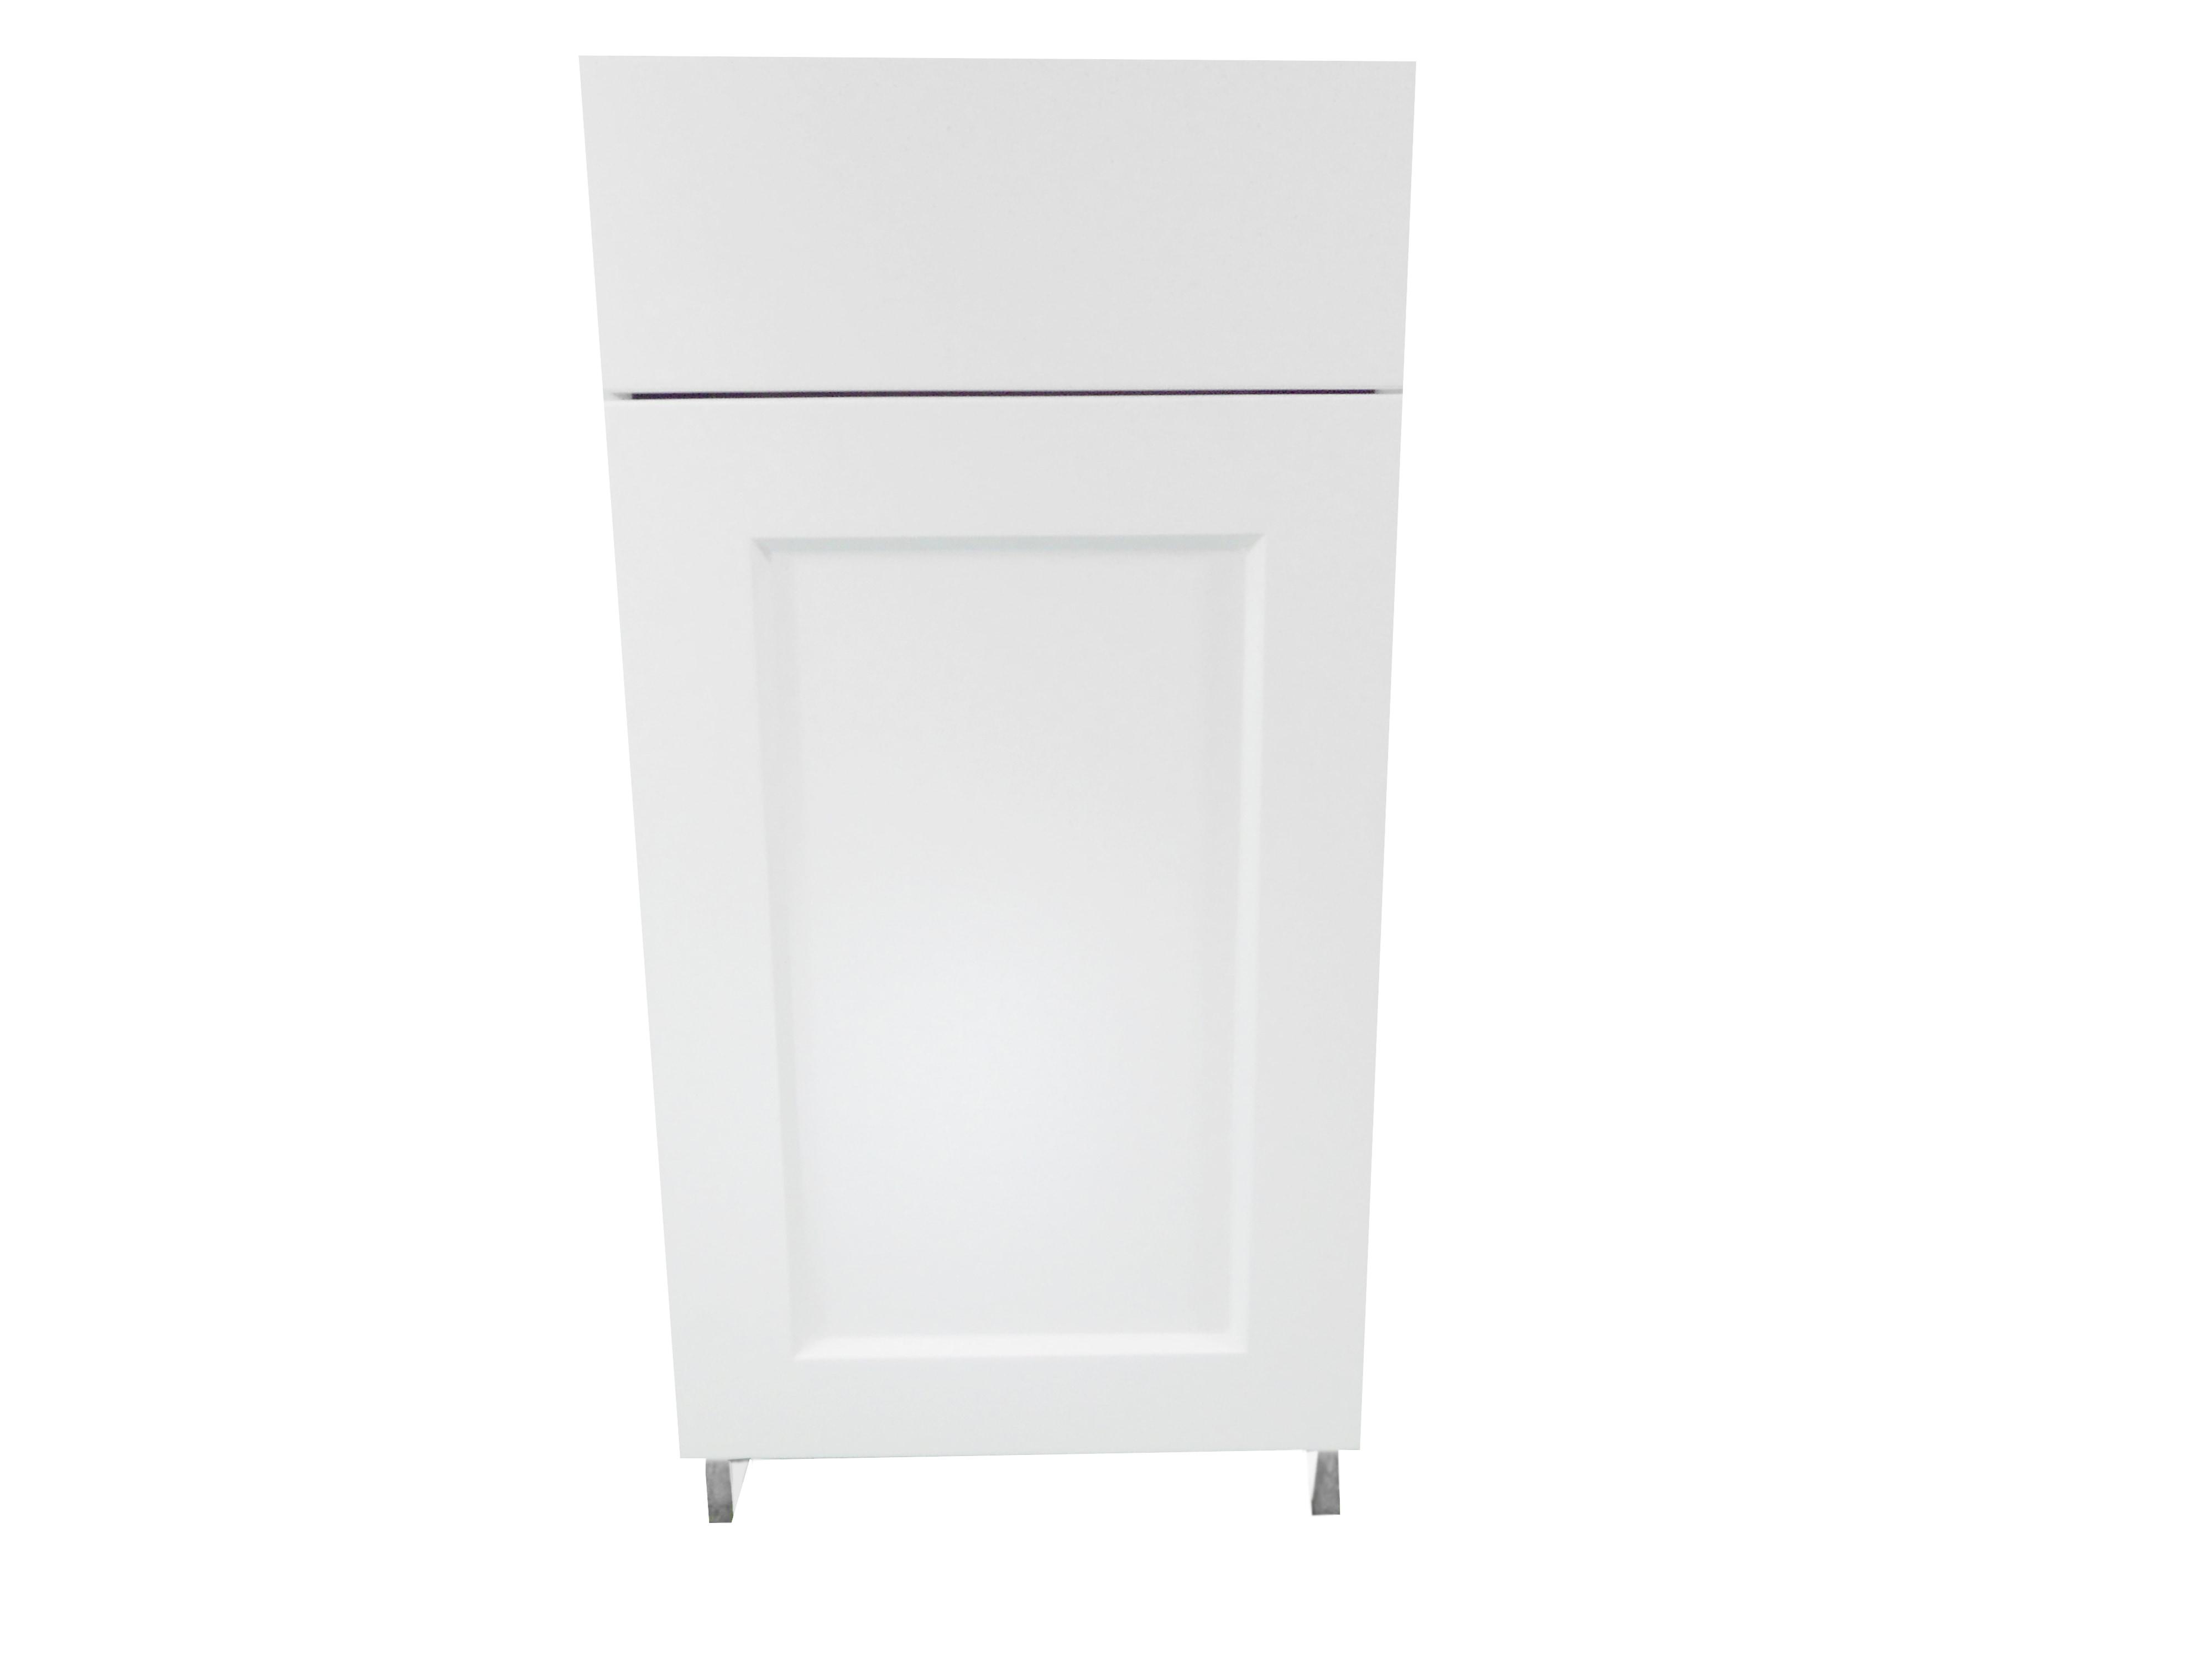 Base Cabinet with Drawer/Door / Wistler White / Flat Panel White / 18 Whistler White 0